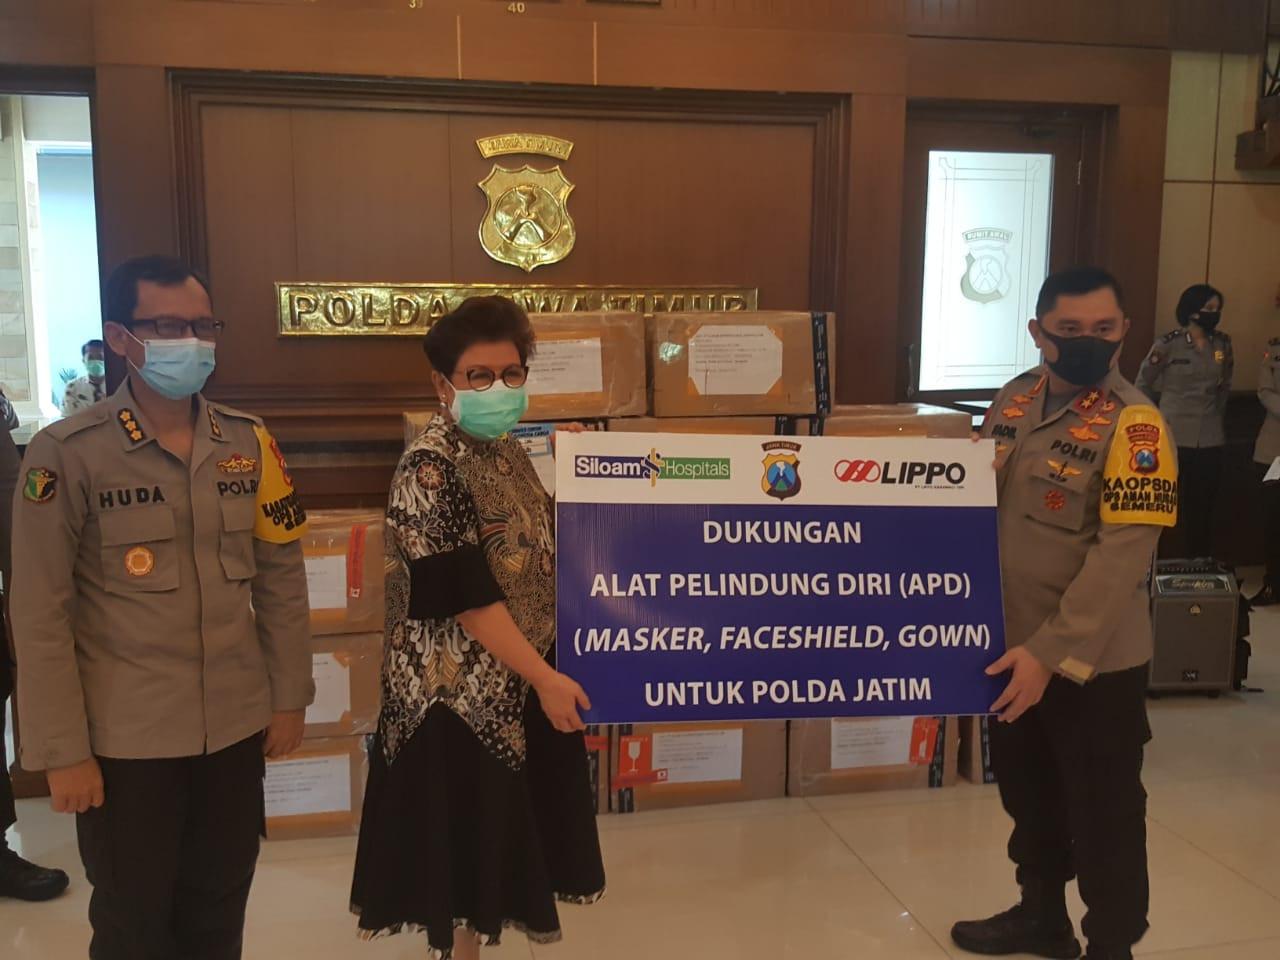 Lawan Corona, Lippo Karawaci Donasikan APD Ke Polda Jatim - JPNN.com